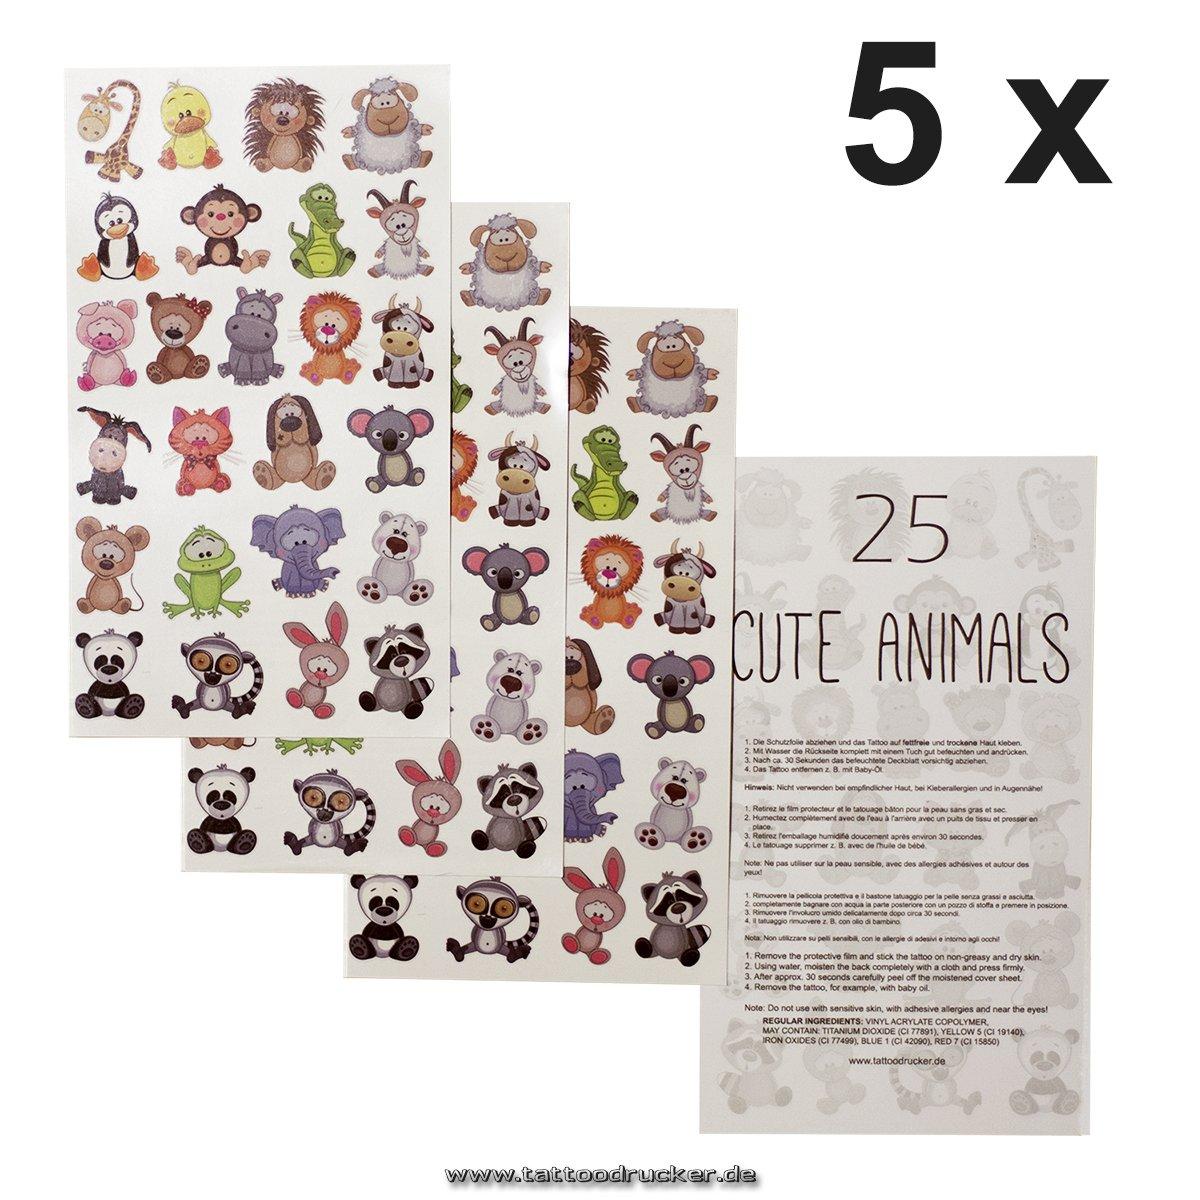 25 temporary Tiny Cute Animals Tattoo Sticker 1 1 x Tier-Kinder Tattoo Bogen Kinder Geburtstag Party